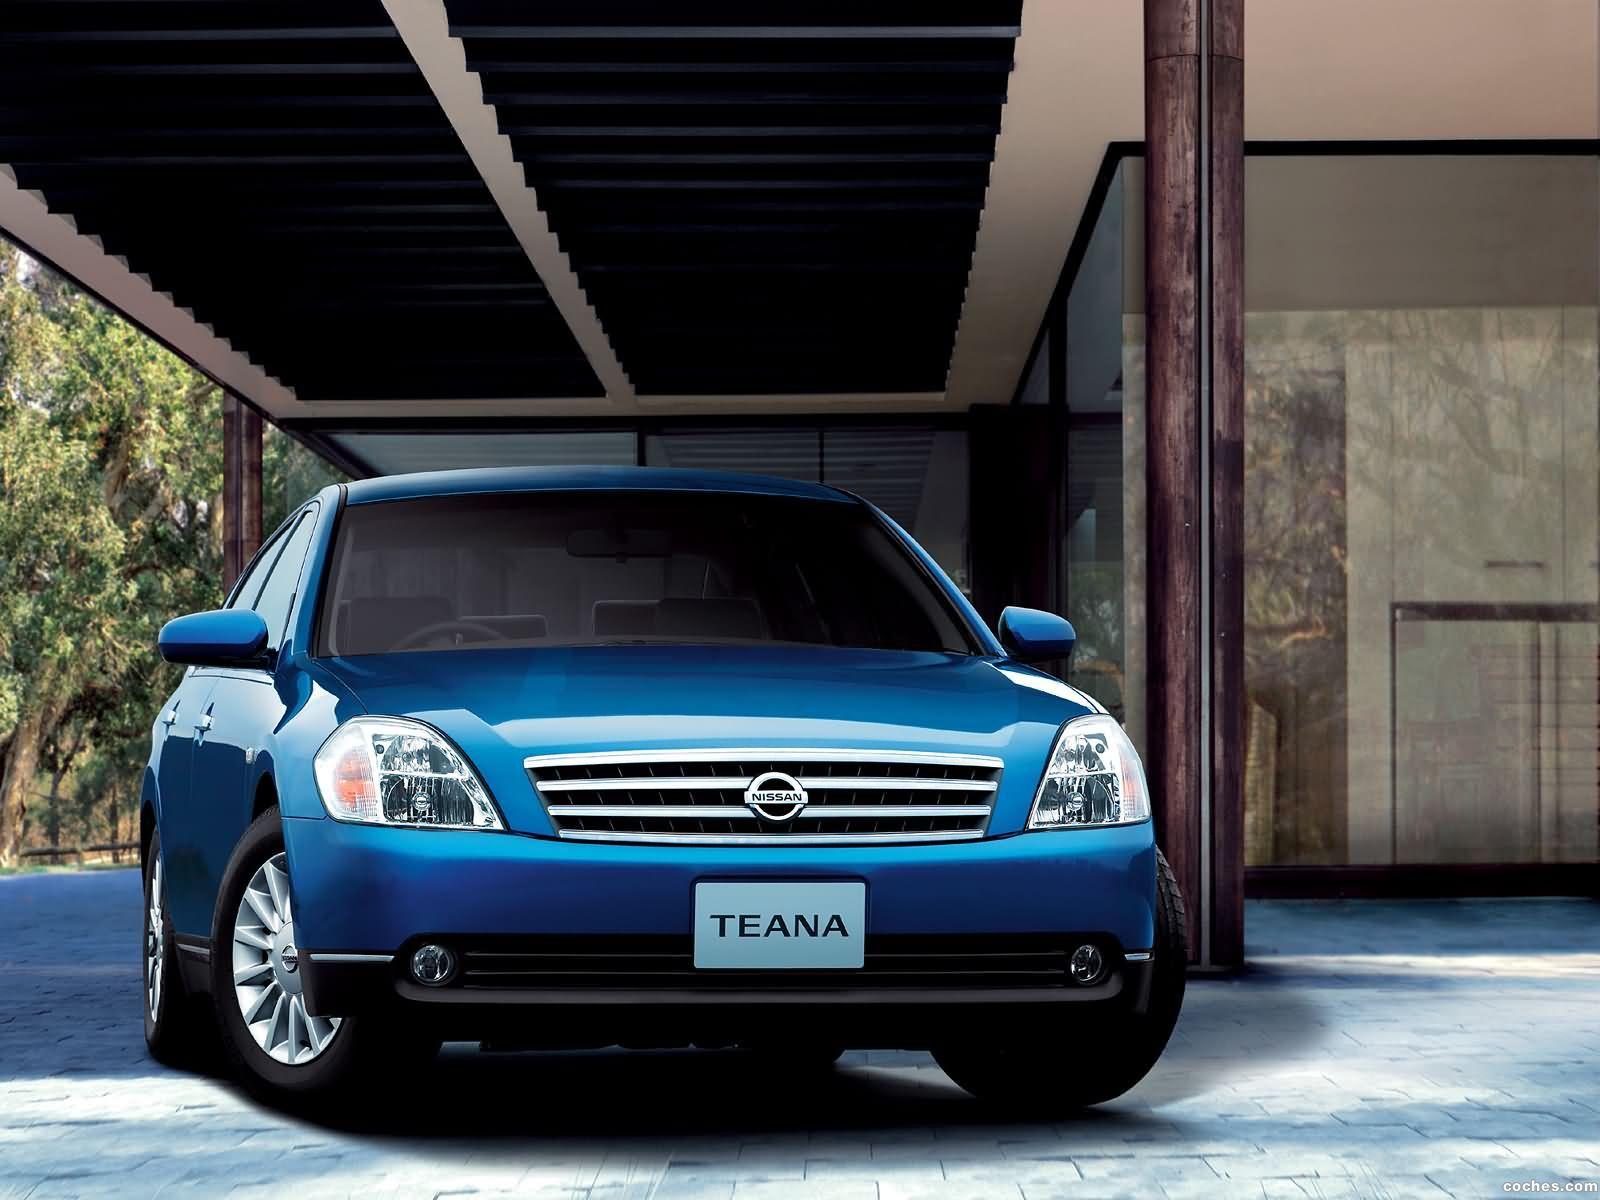 Foto 0 de Nissan Teana 2003